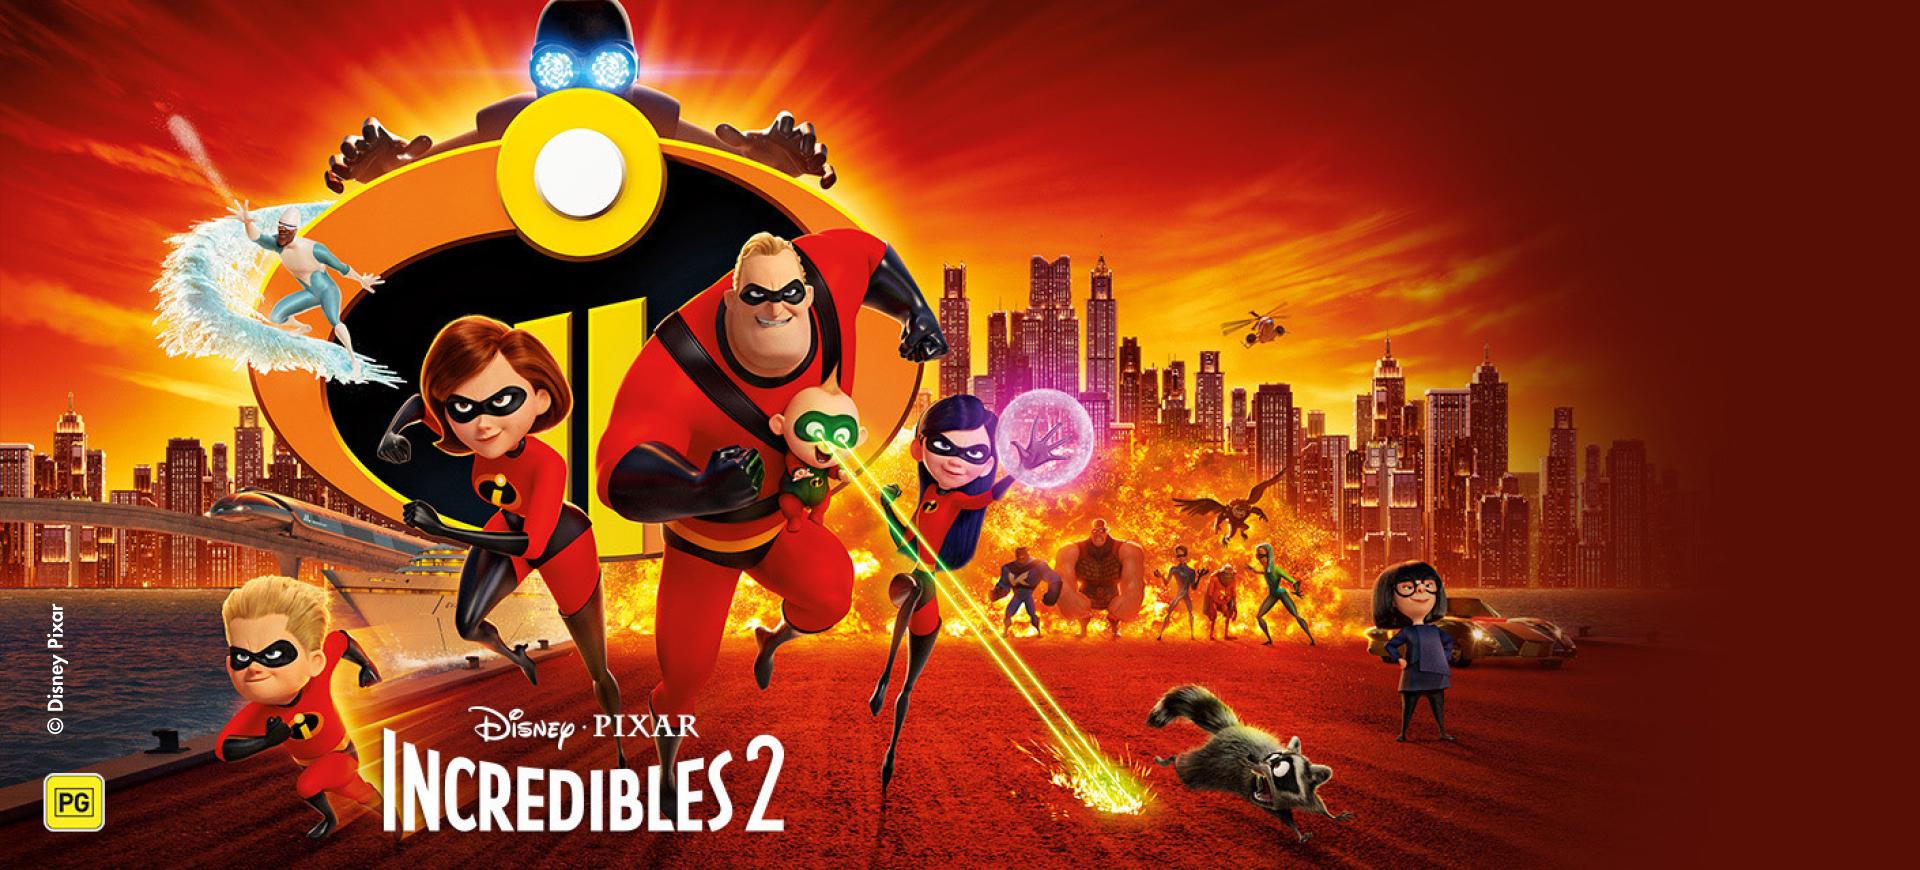 Incredibles 2 movie night